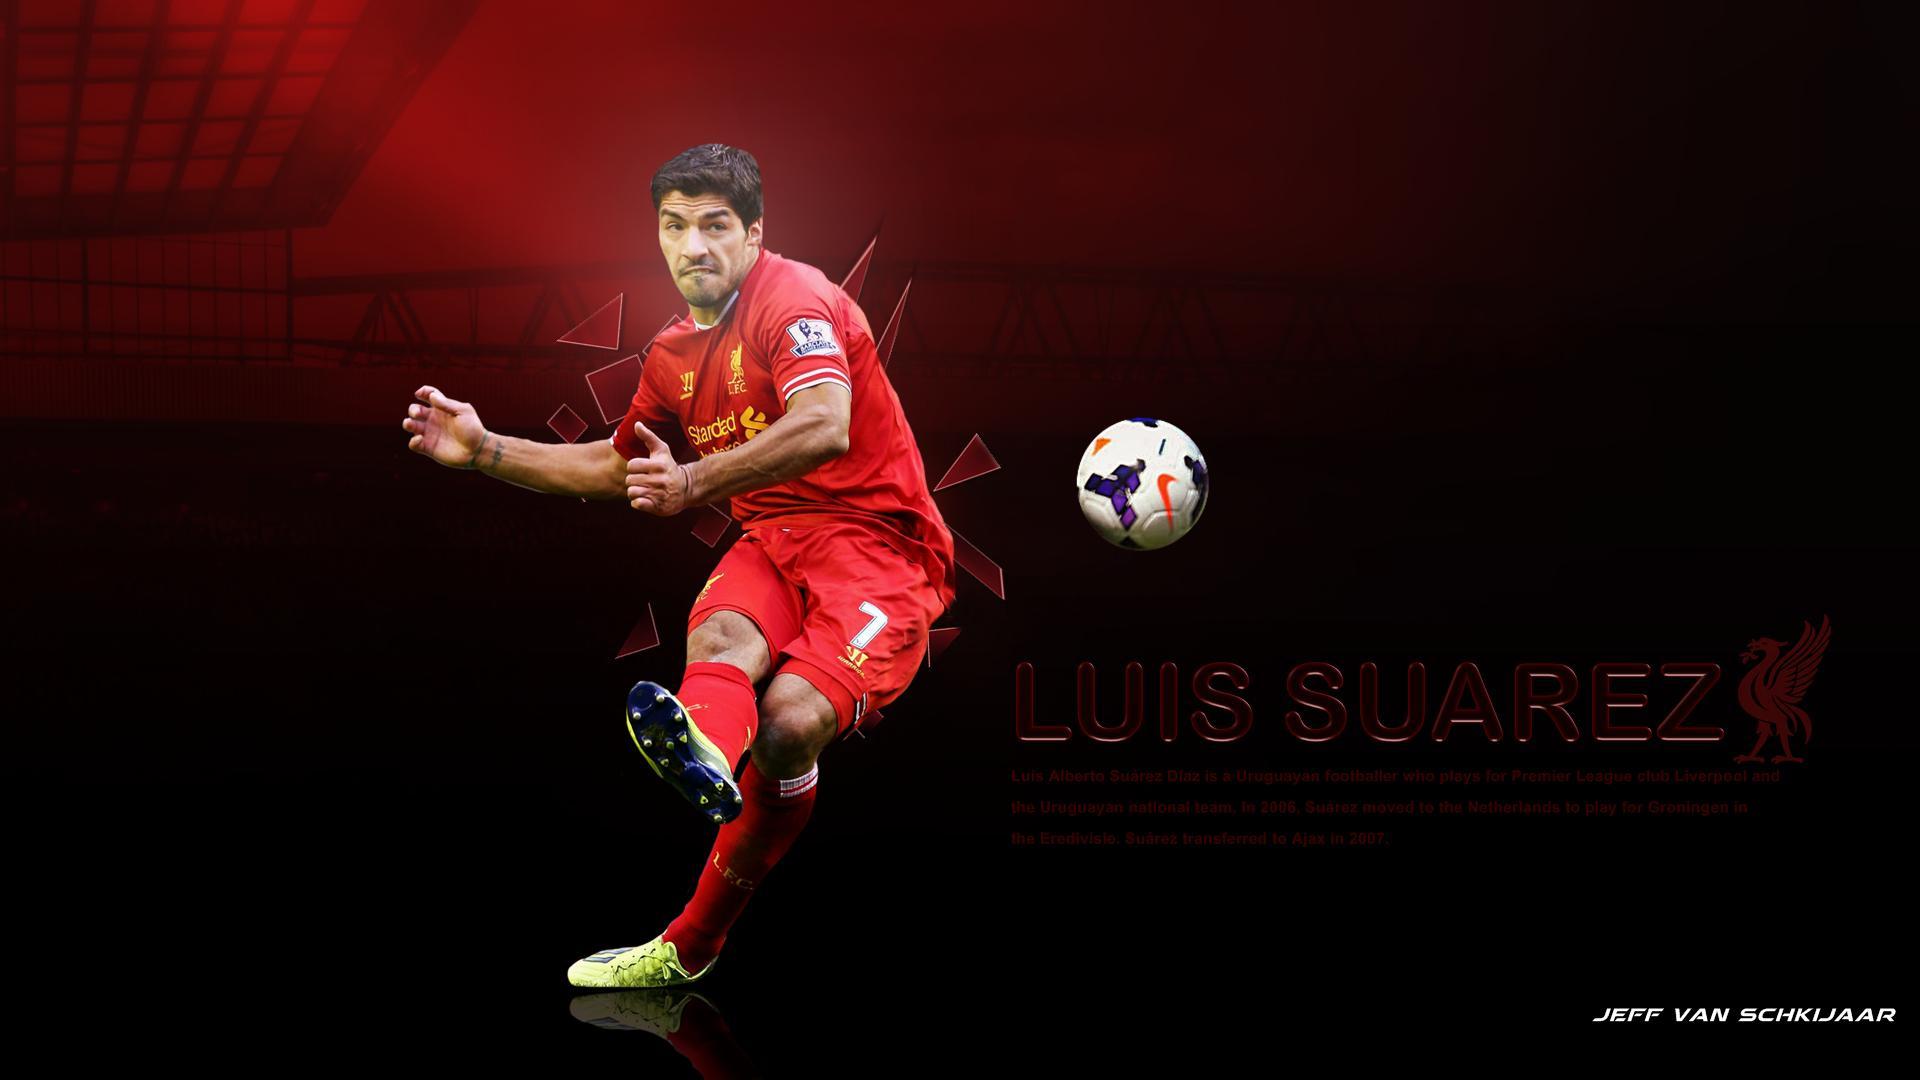 Luis Suarez HD Wallpapers   BackgroundHDWallpapers 1920x1080